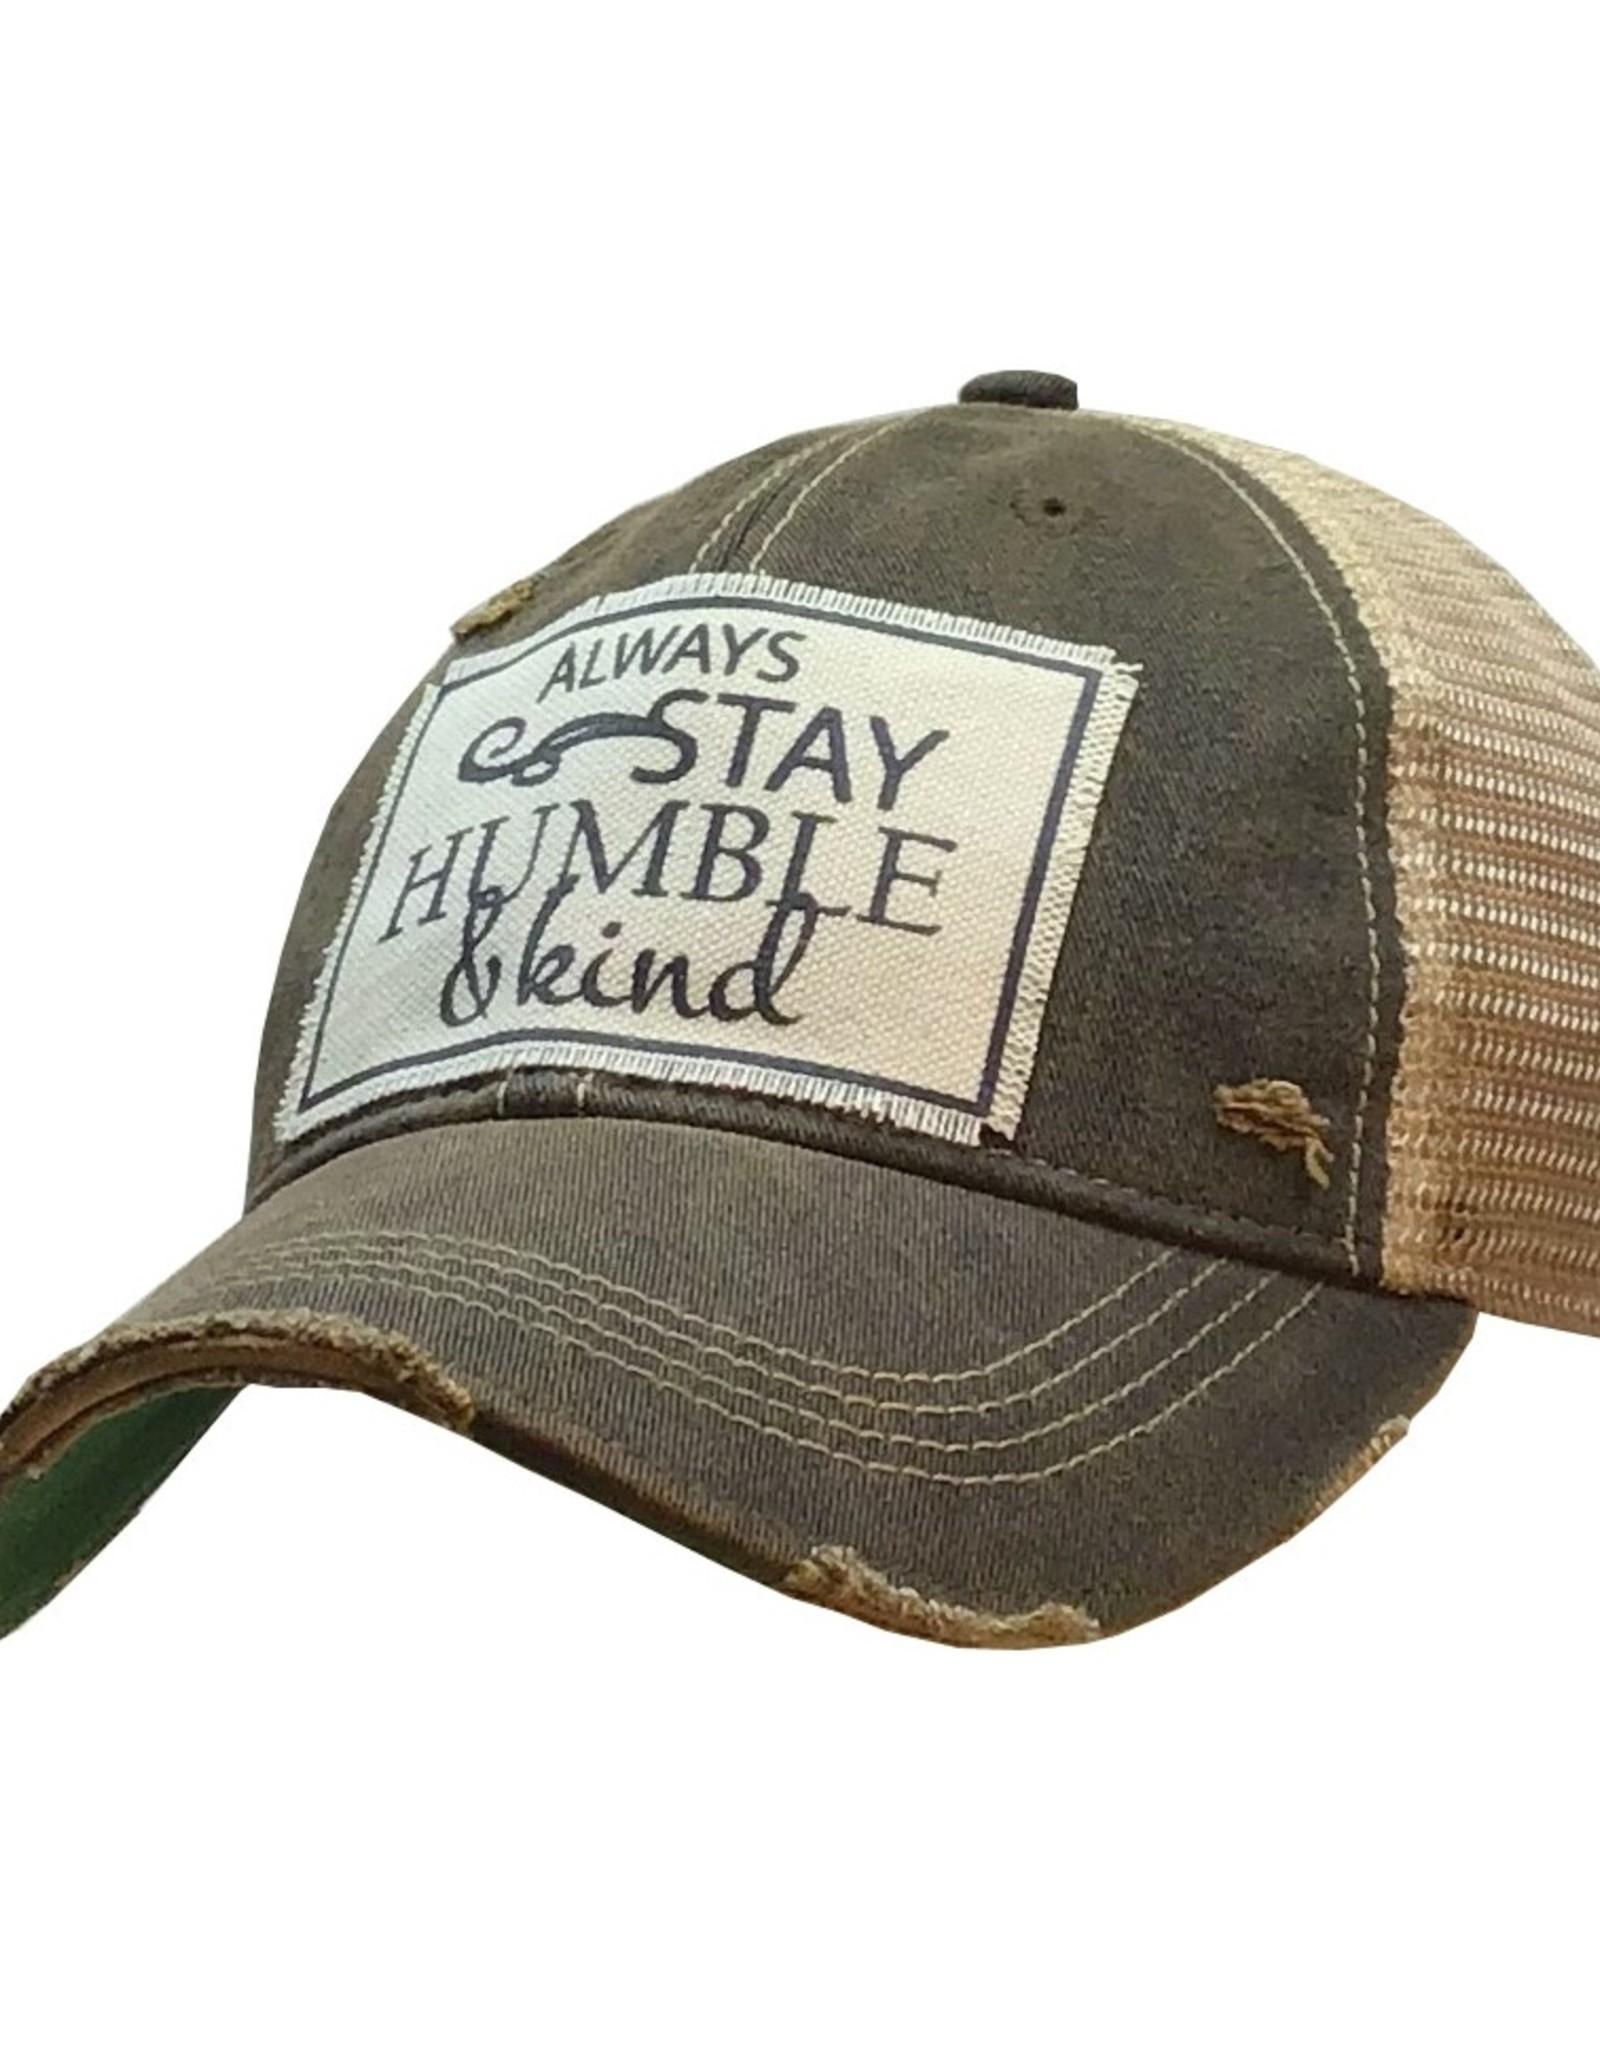 VINTAGE LIFE DISTRESSED TRUCKER CAP